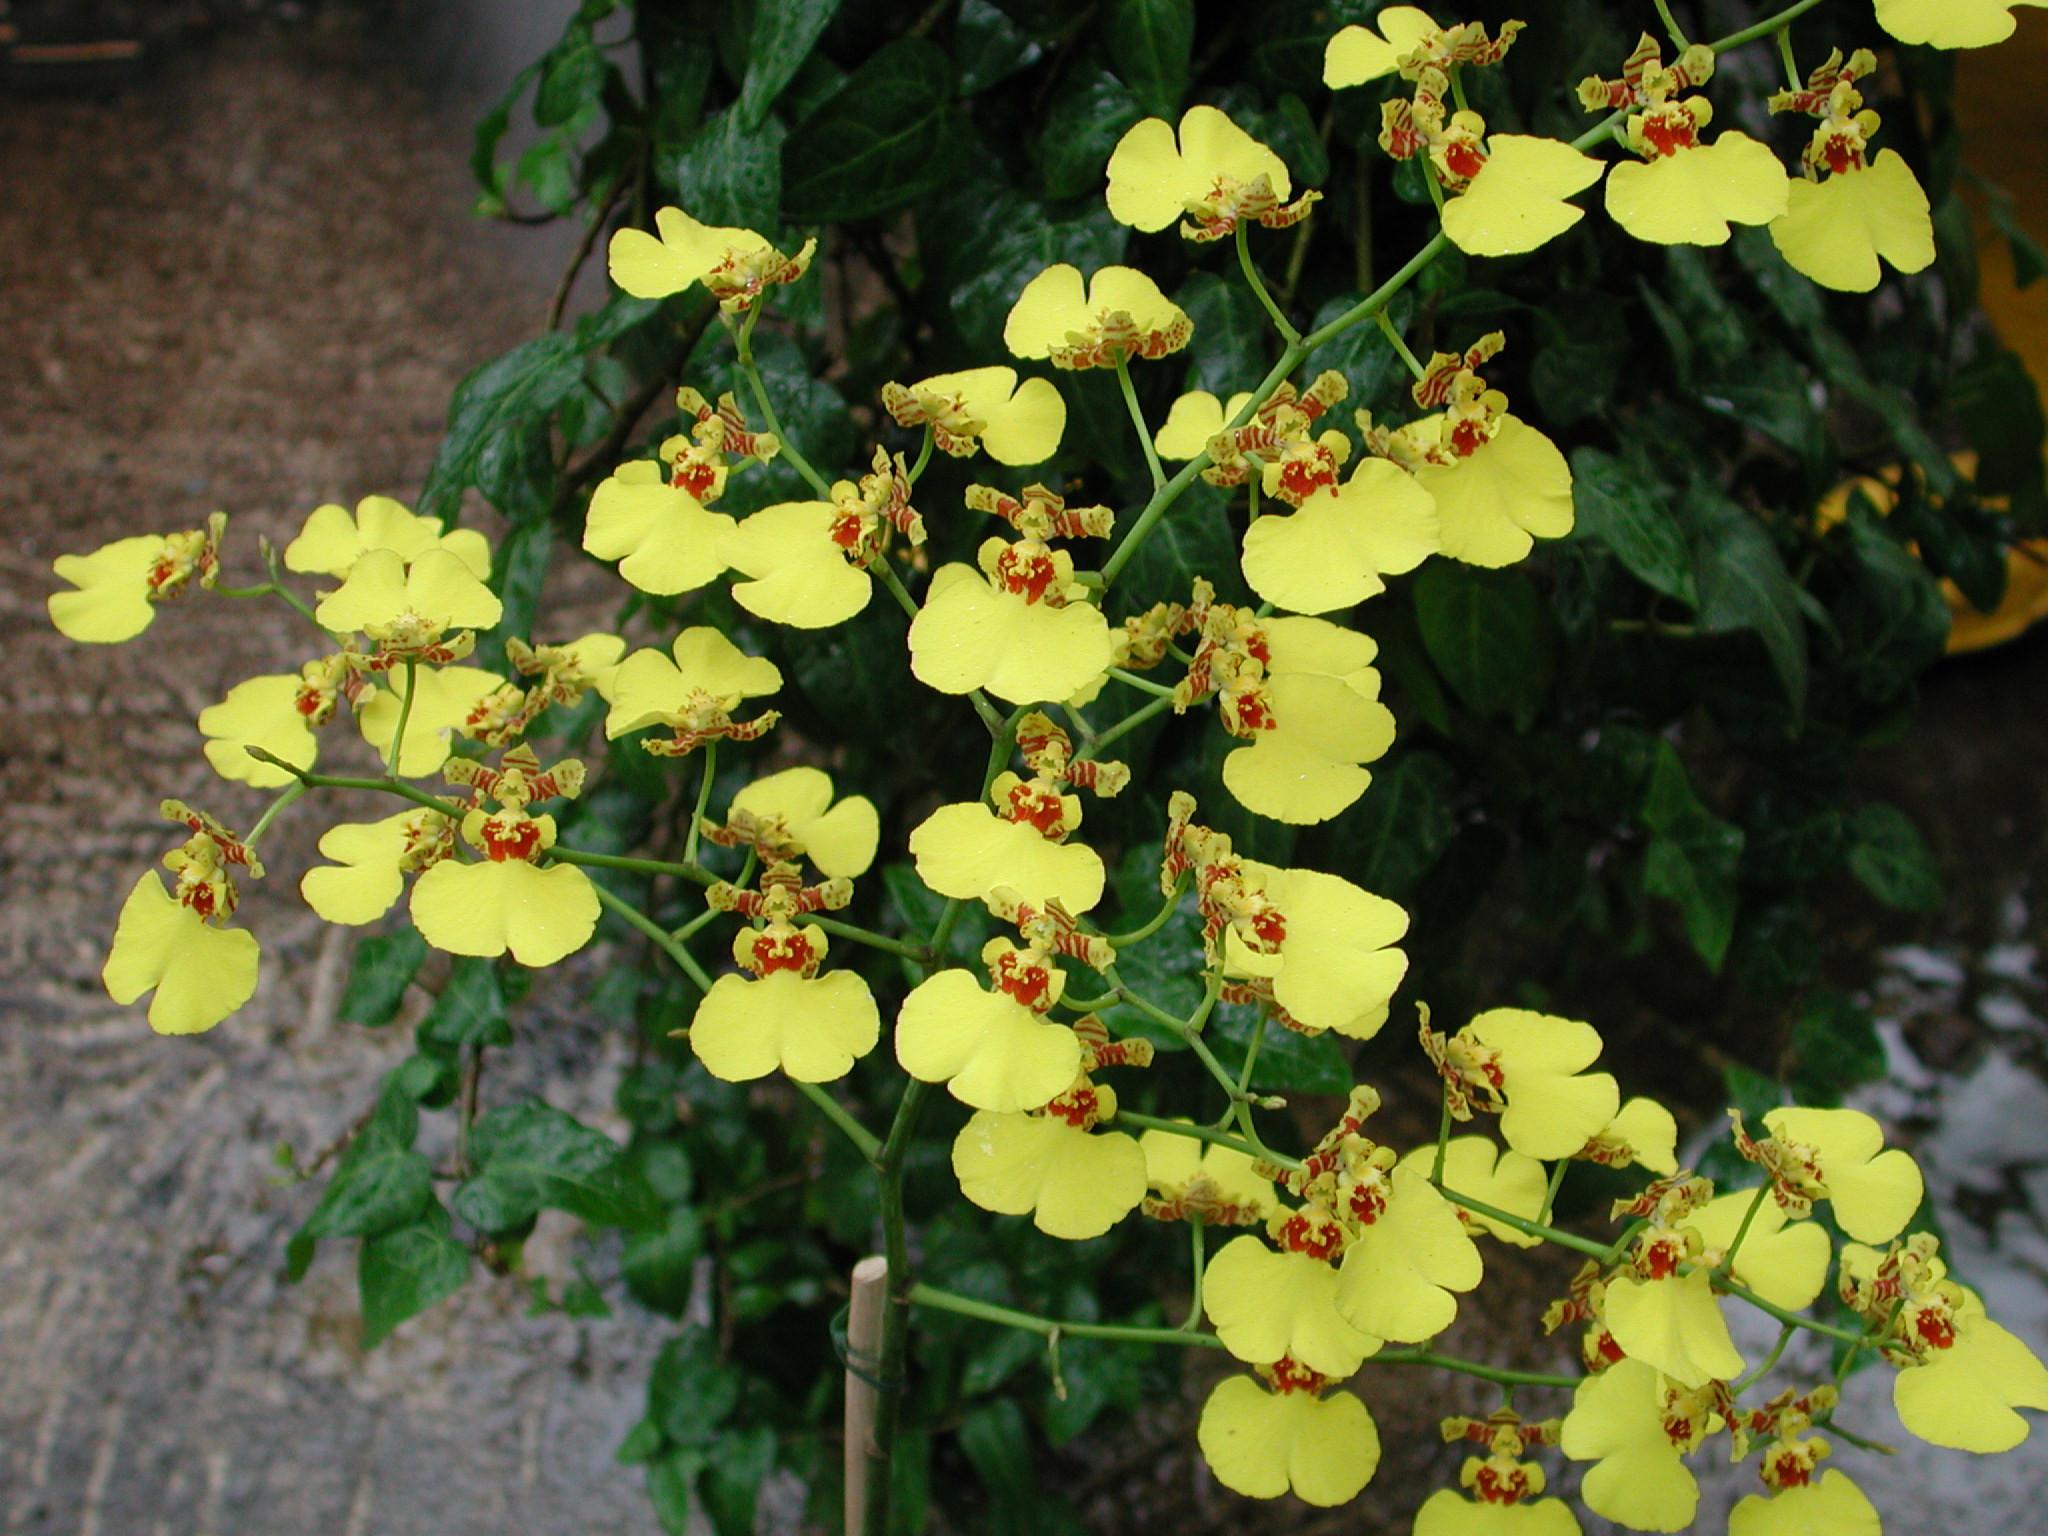 http://www.orchideen-wichmann.de/media/catalog/product/cache/1/image/9df78eab33525d08d6e5fb8d27136e95/o/n/oncidium_gower_ramsey.jpg